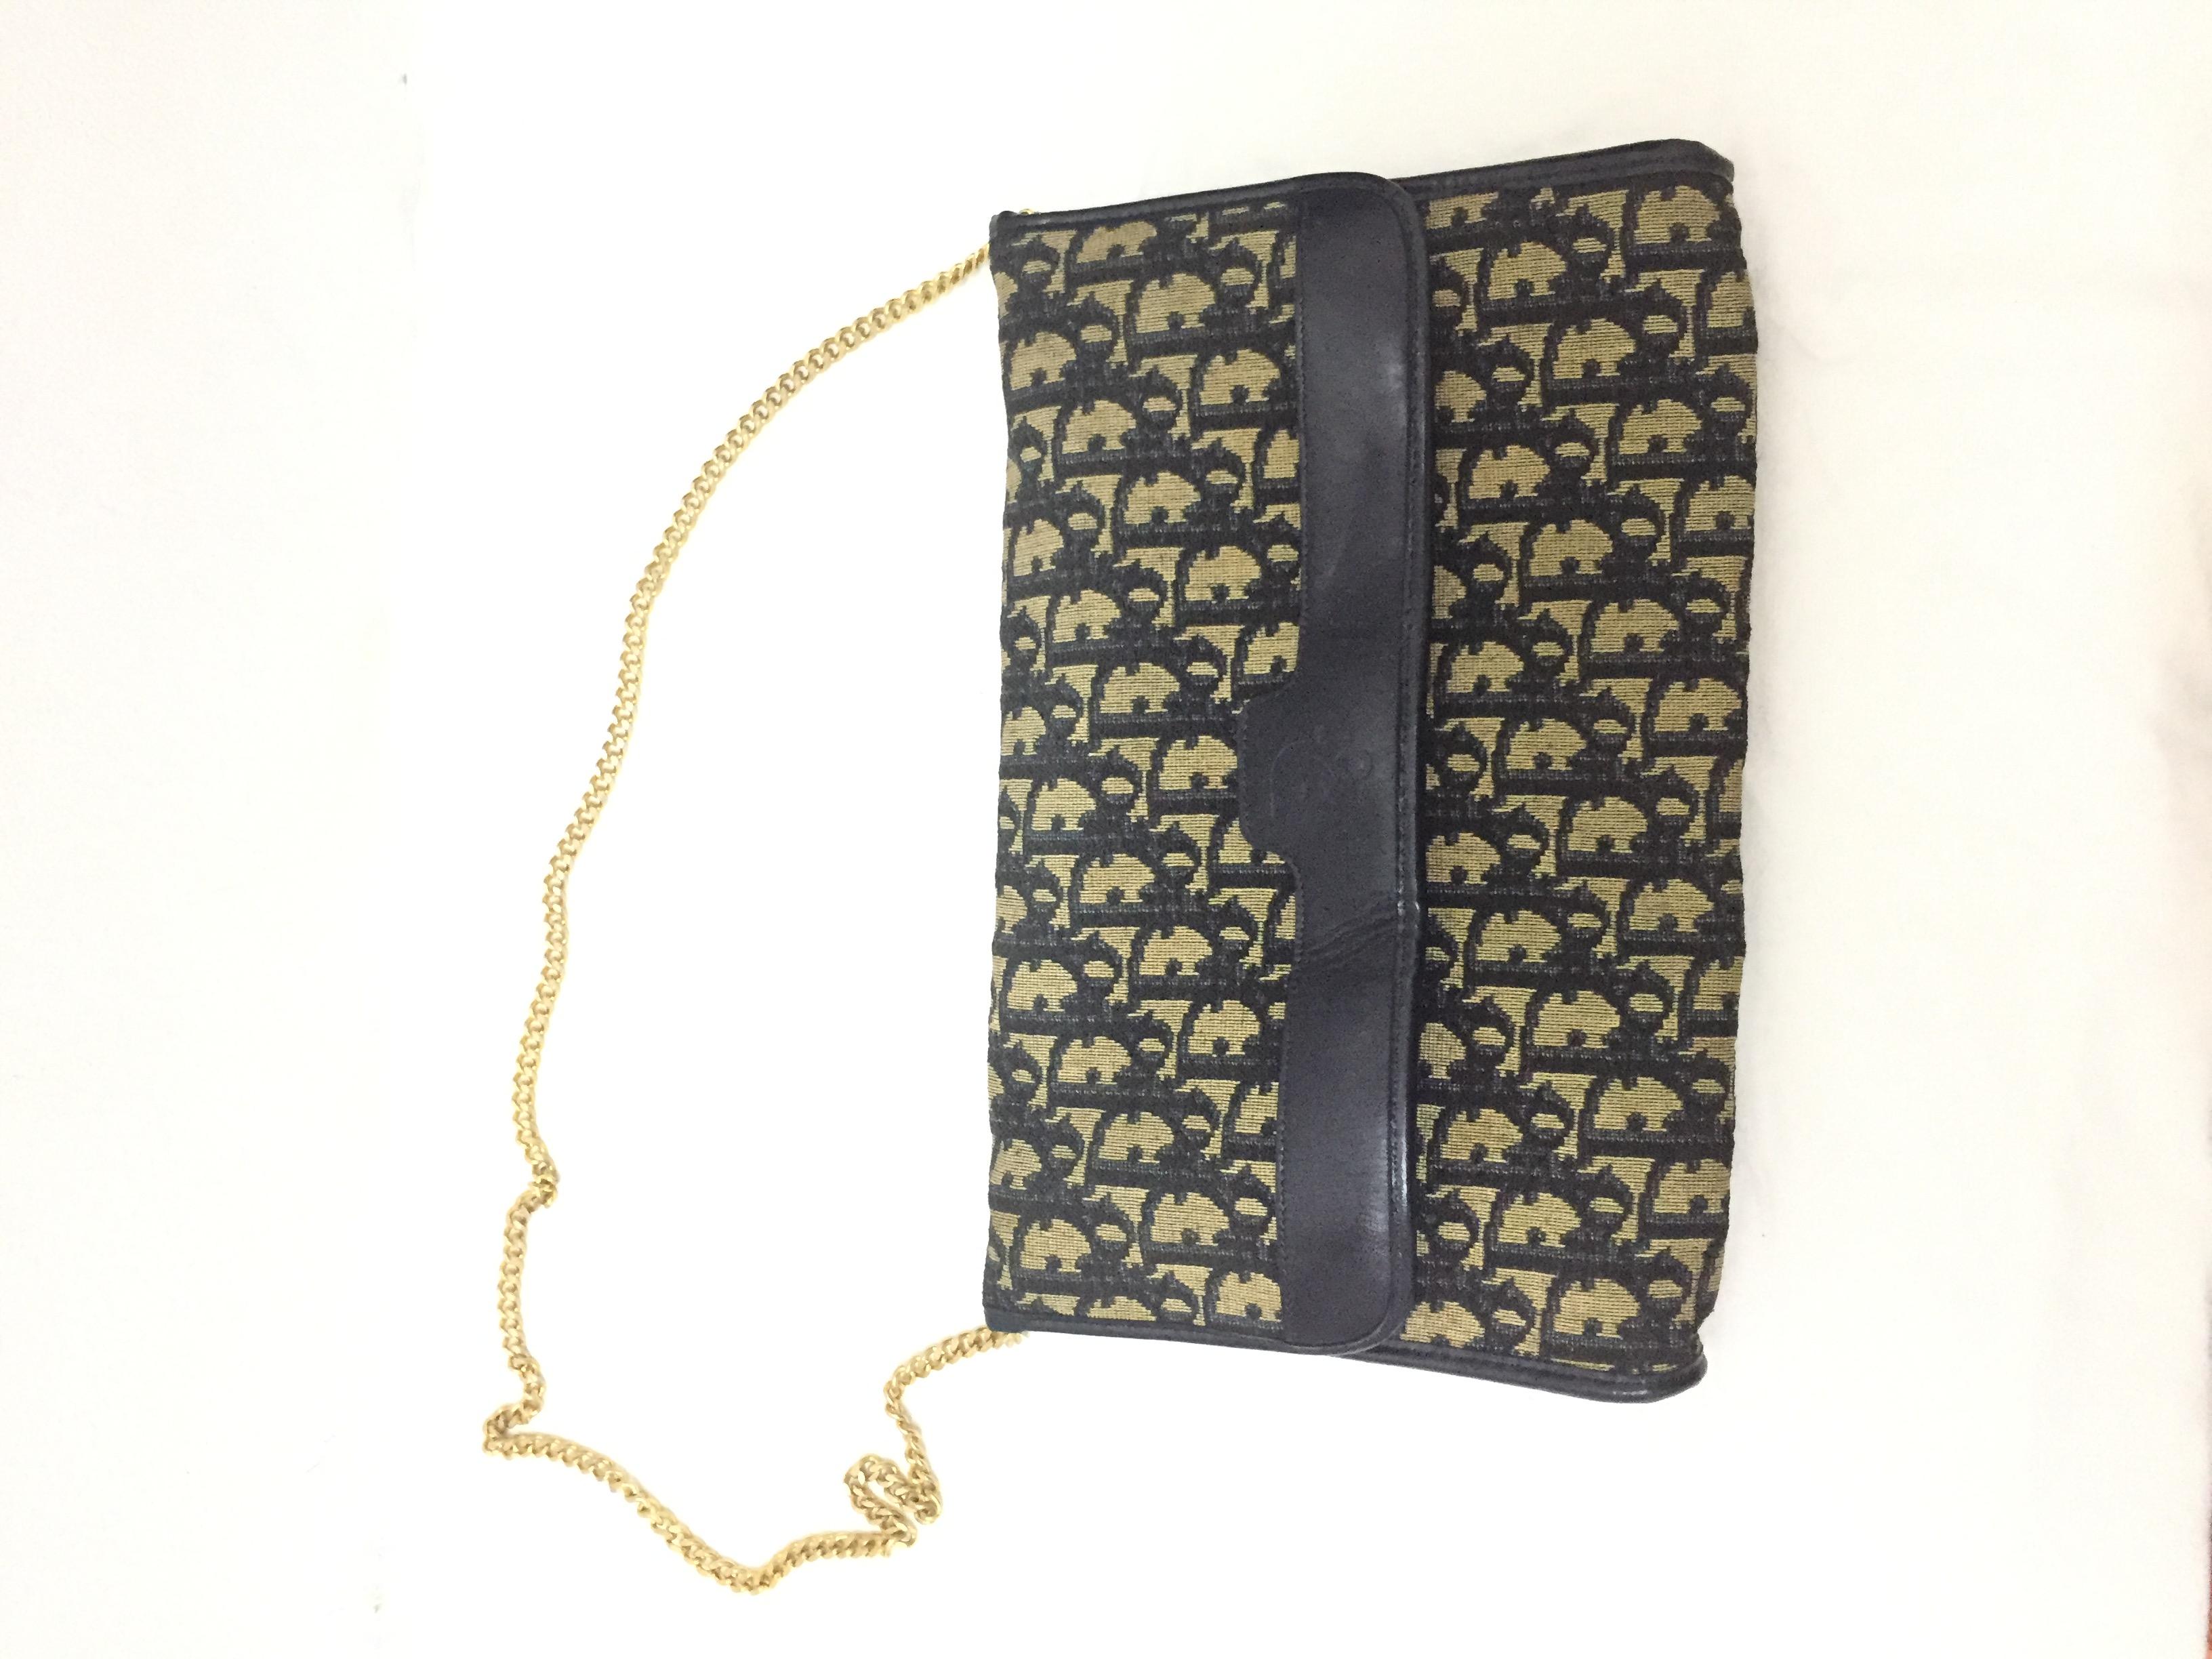 d53a1135d5cafa Dior 80's Dior Monogram Muff Bag Made In France | Grailed